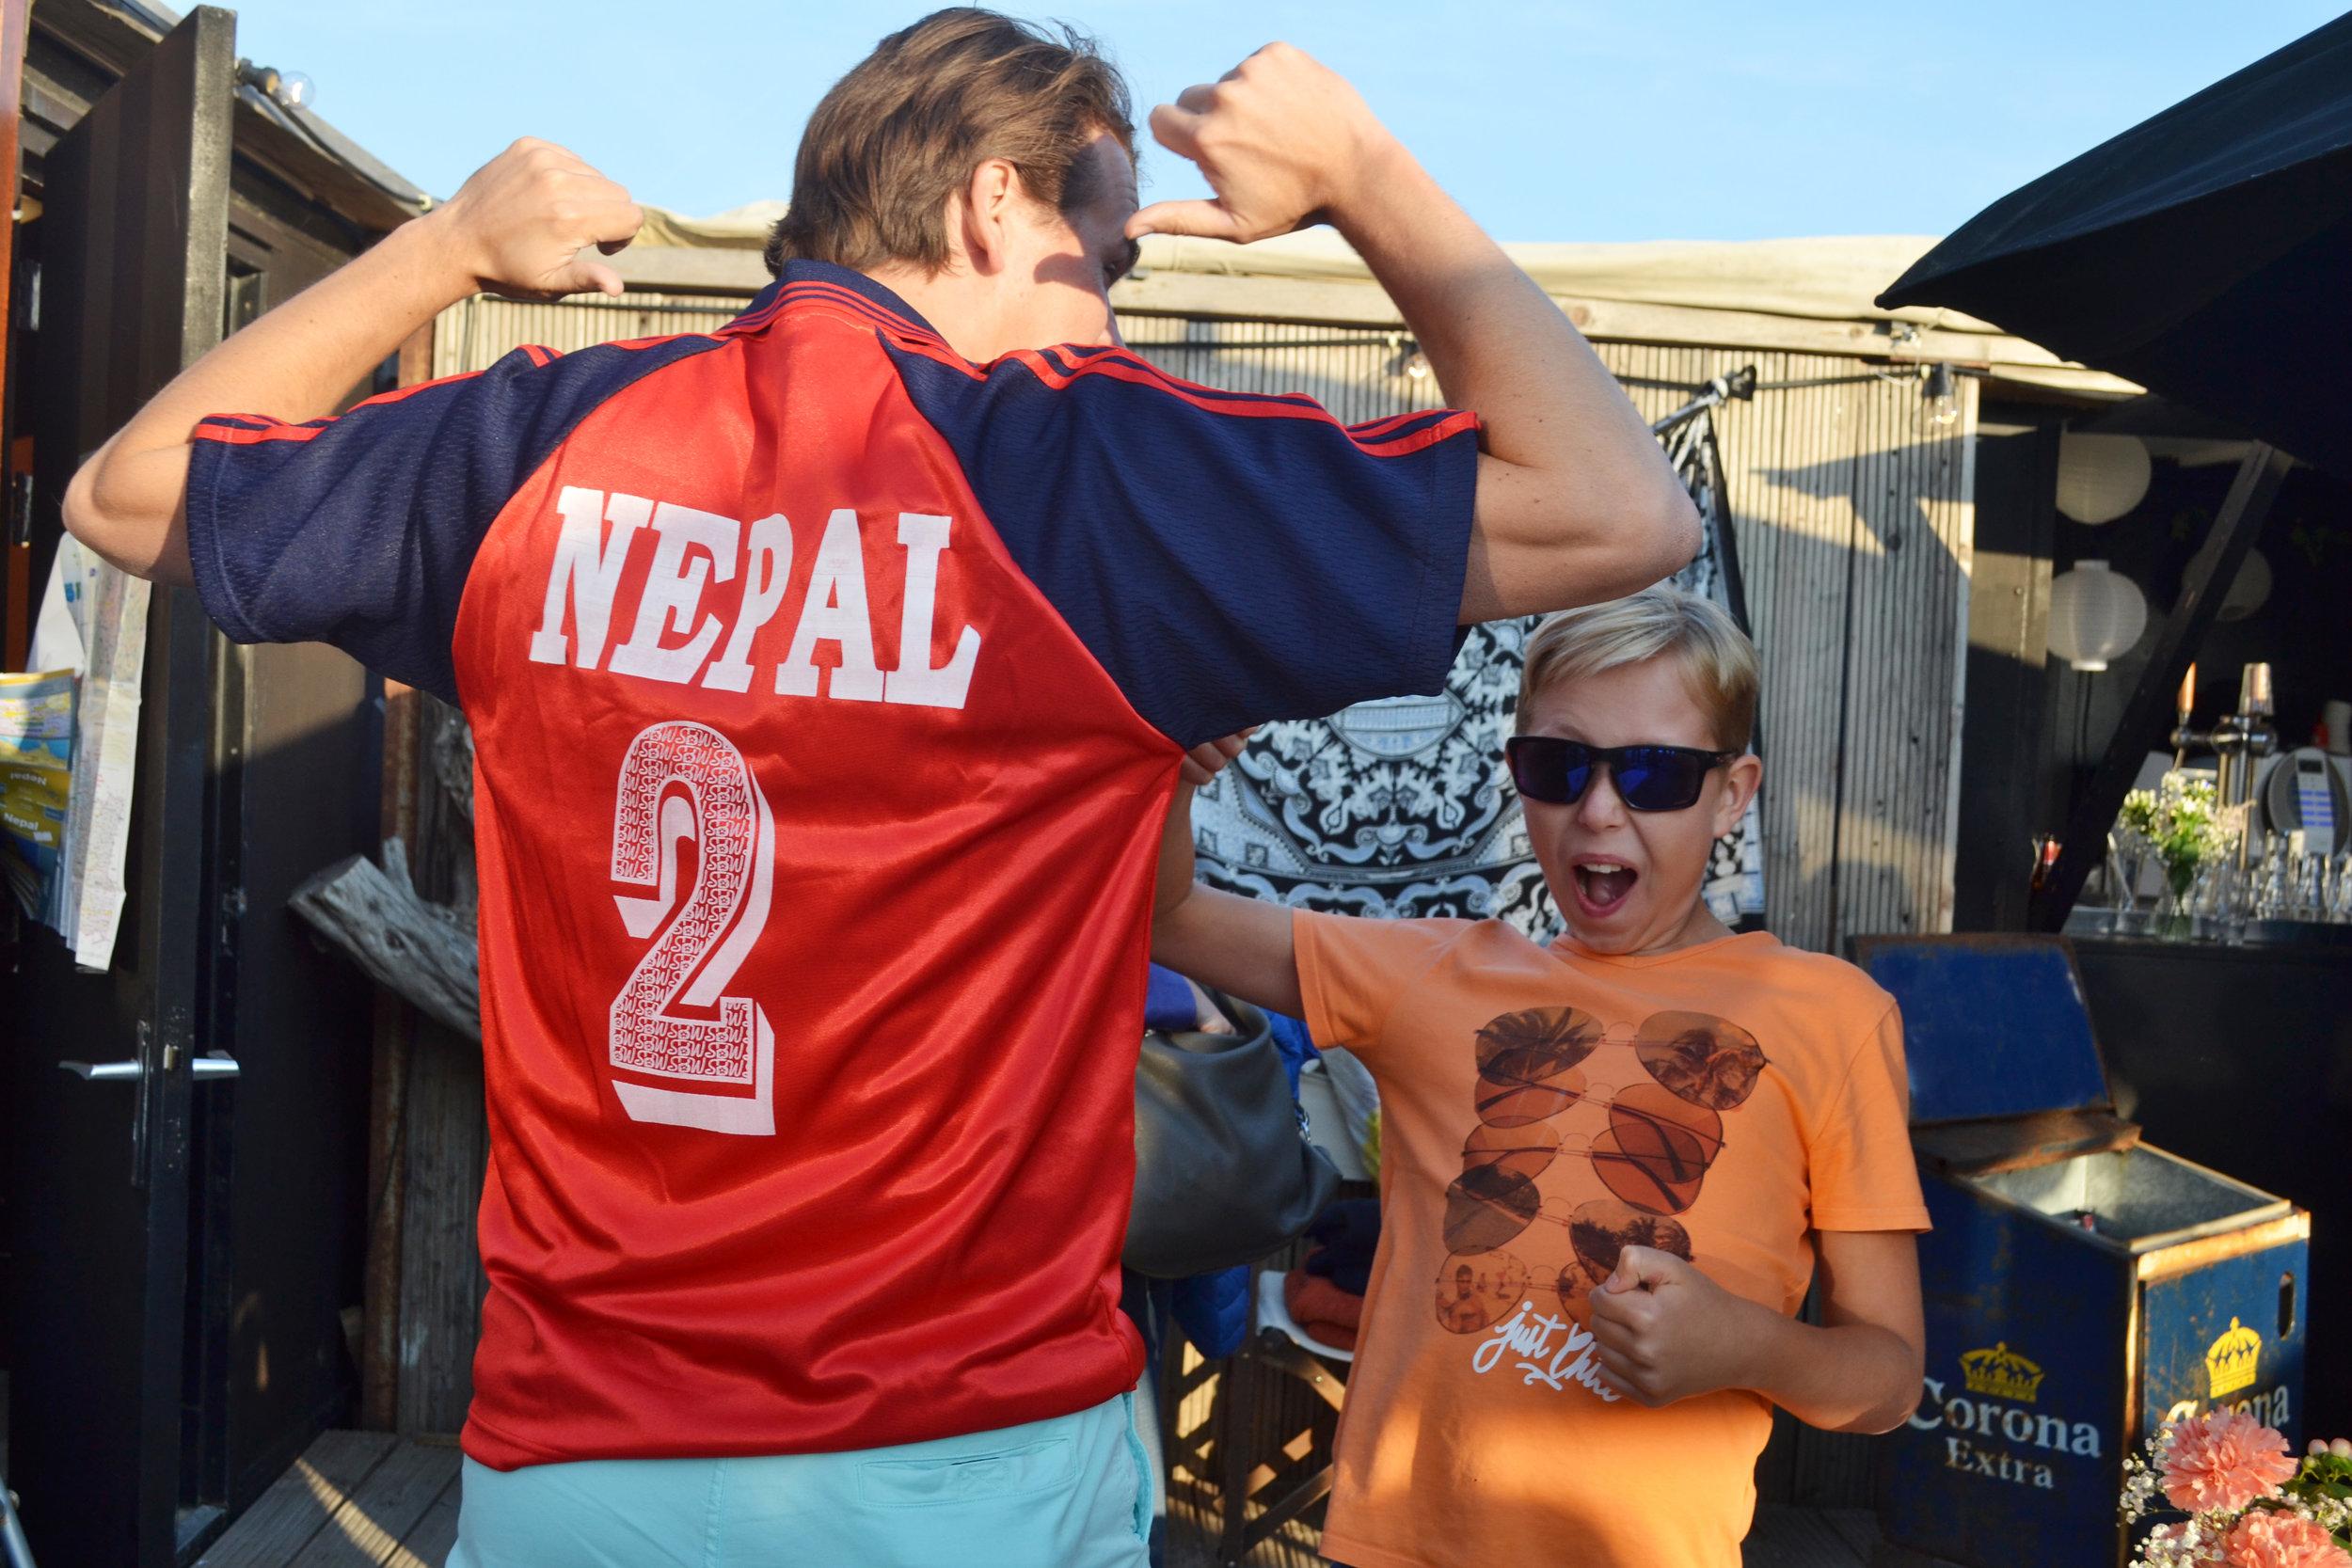 Nepal football t-shirt fetched Euro 100